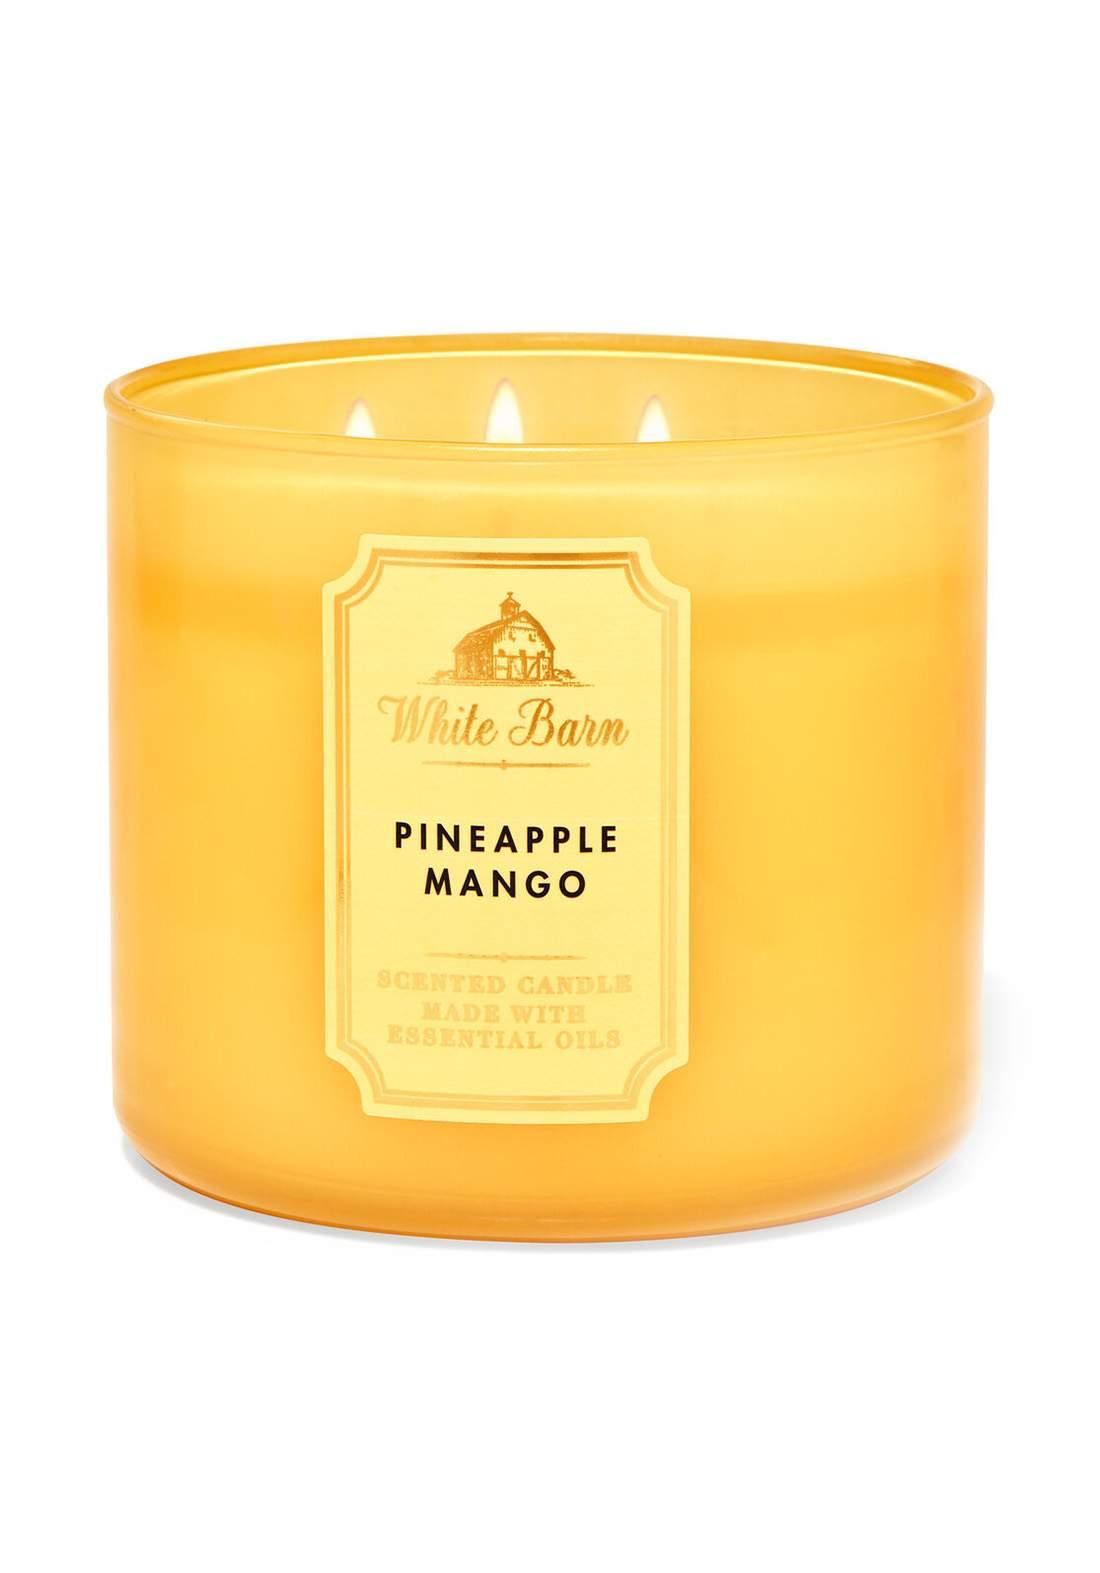 Bath And Body Works White Barn Pineapple Mango 3-Wick Candle 411g  شمعة عطرية